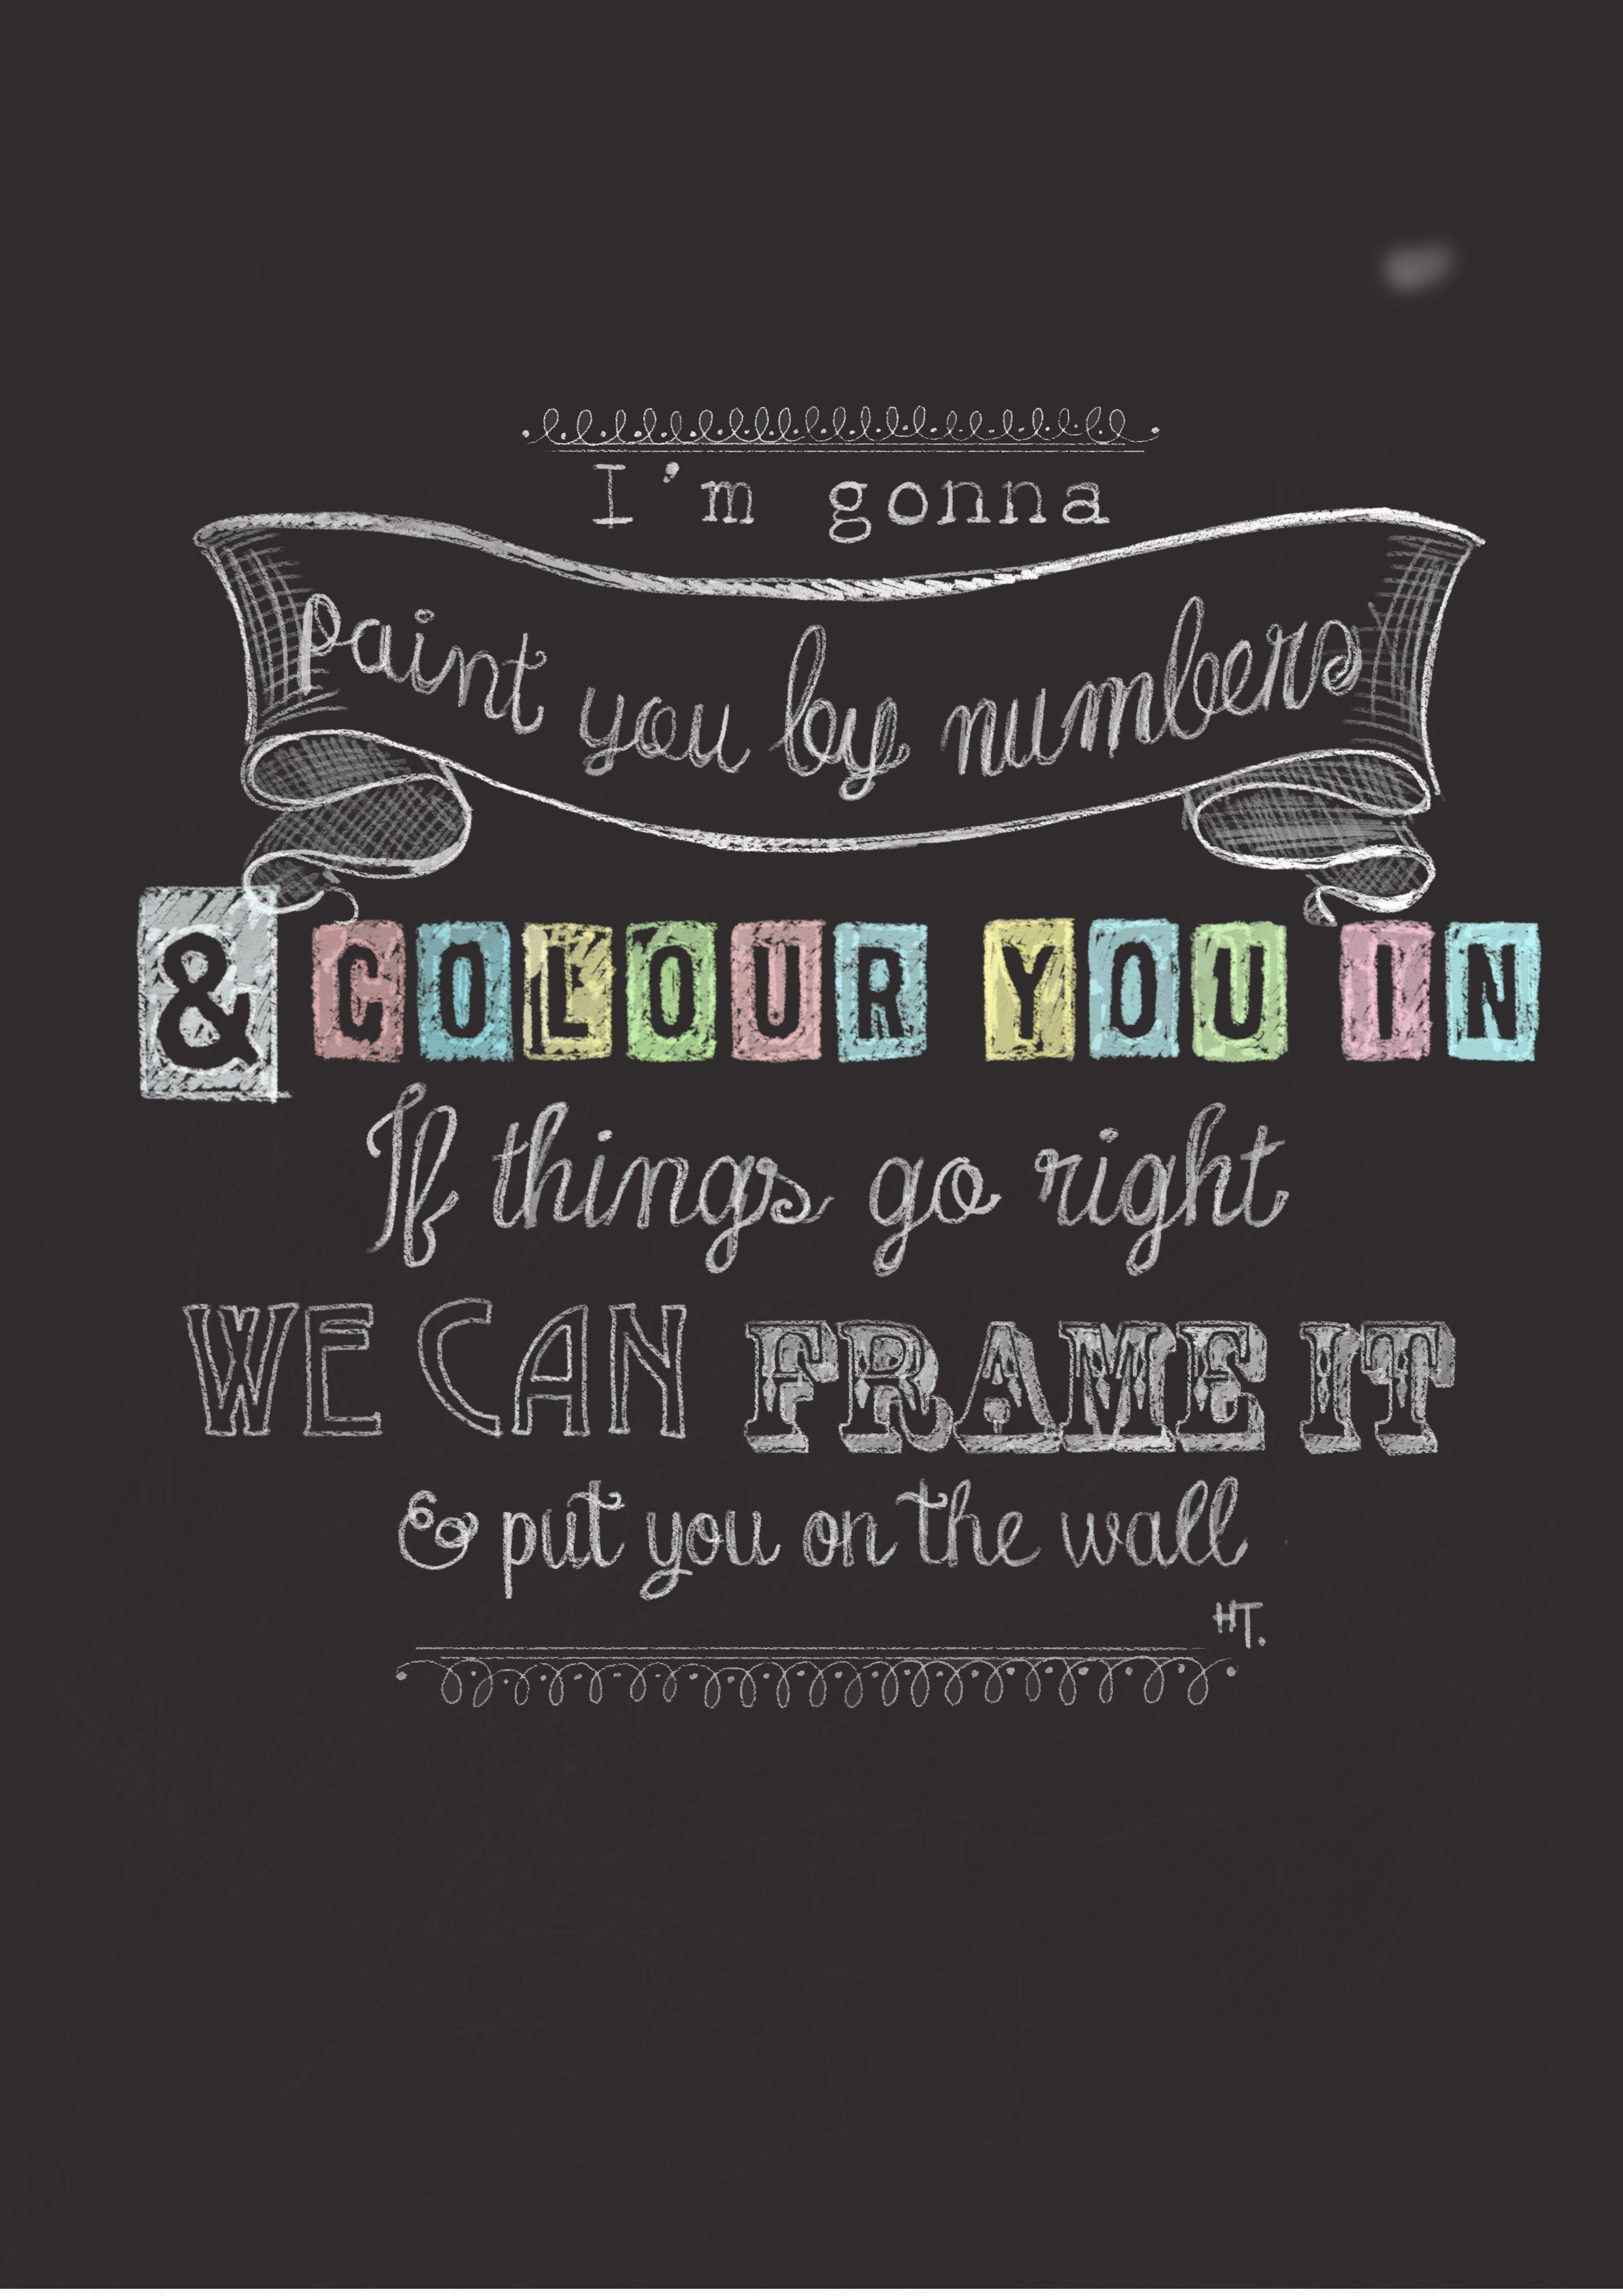 ed sheeran lego house lyrics on chalk board Graphic illustration digital paint